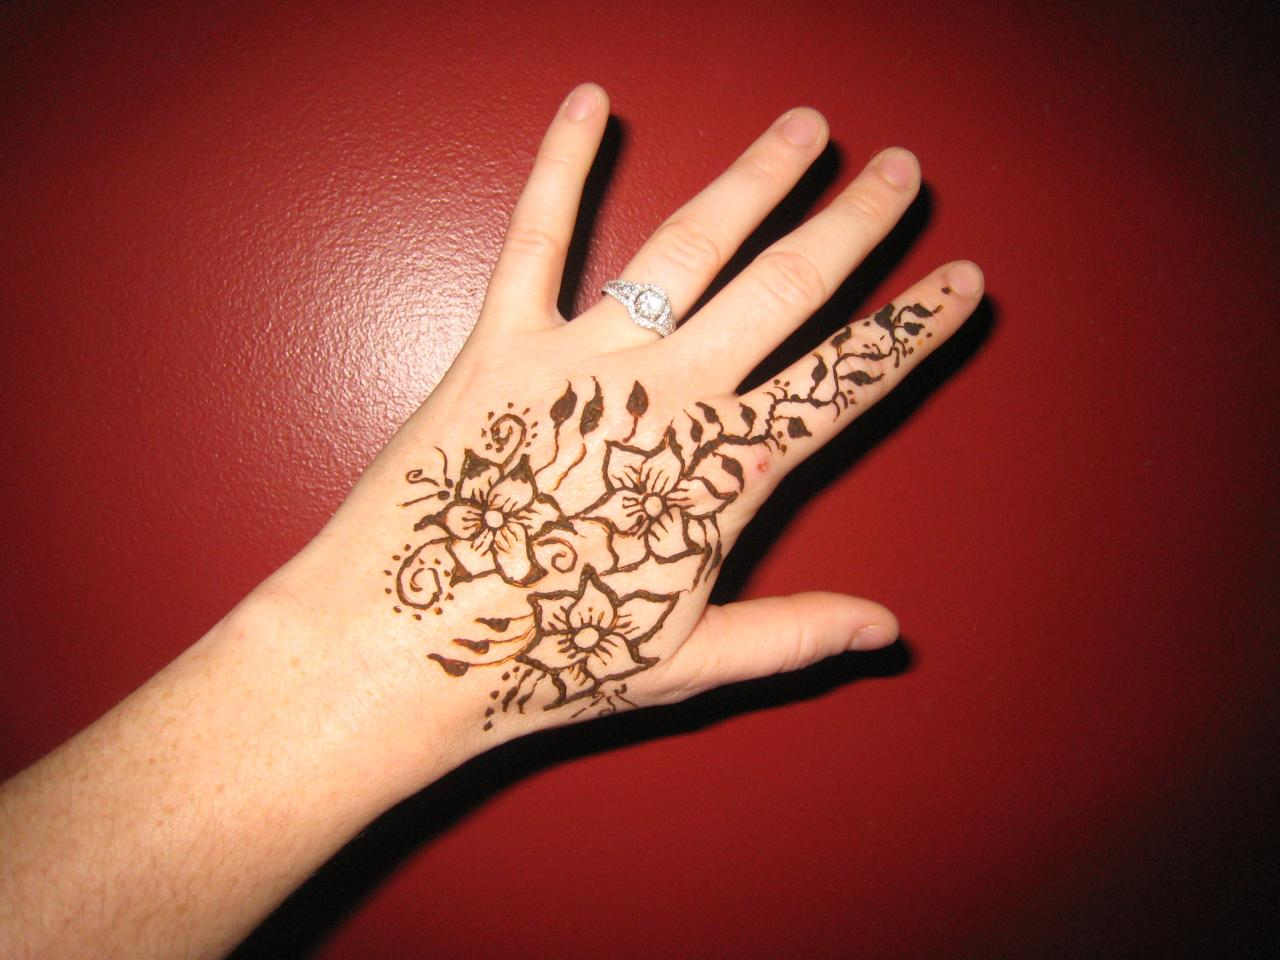 Designs By Jenn - Henna Tattoos